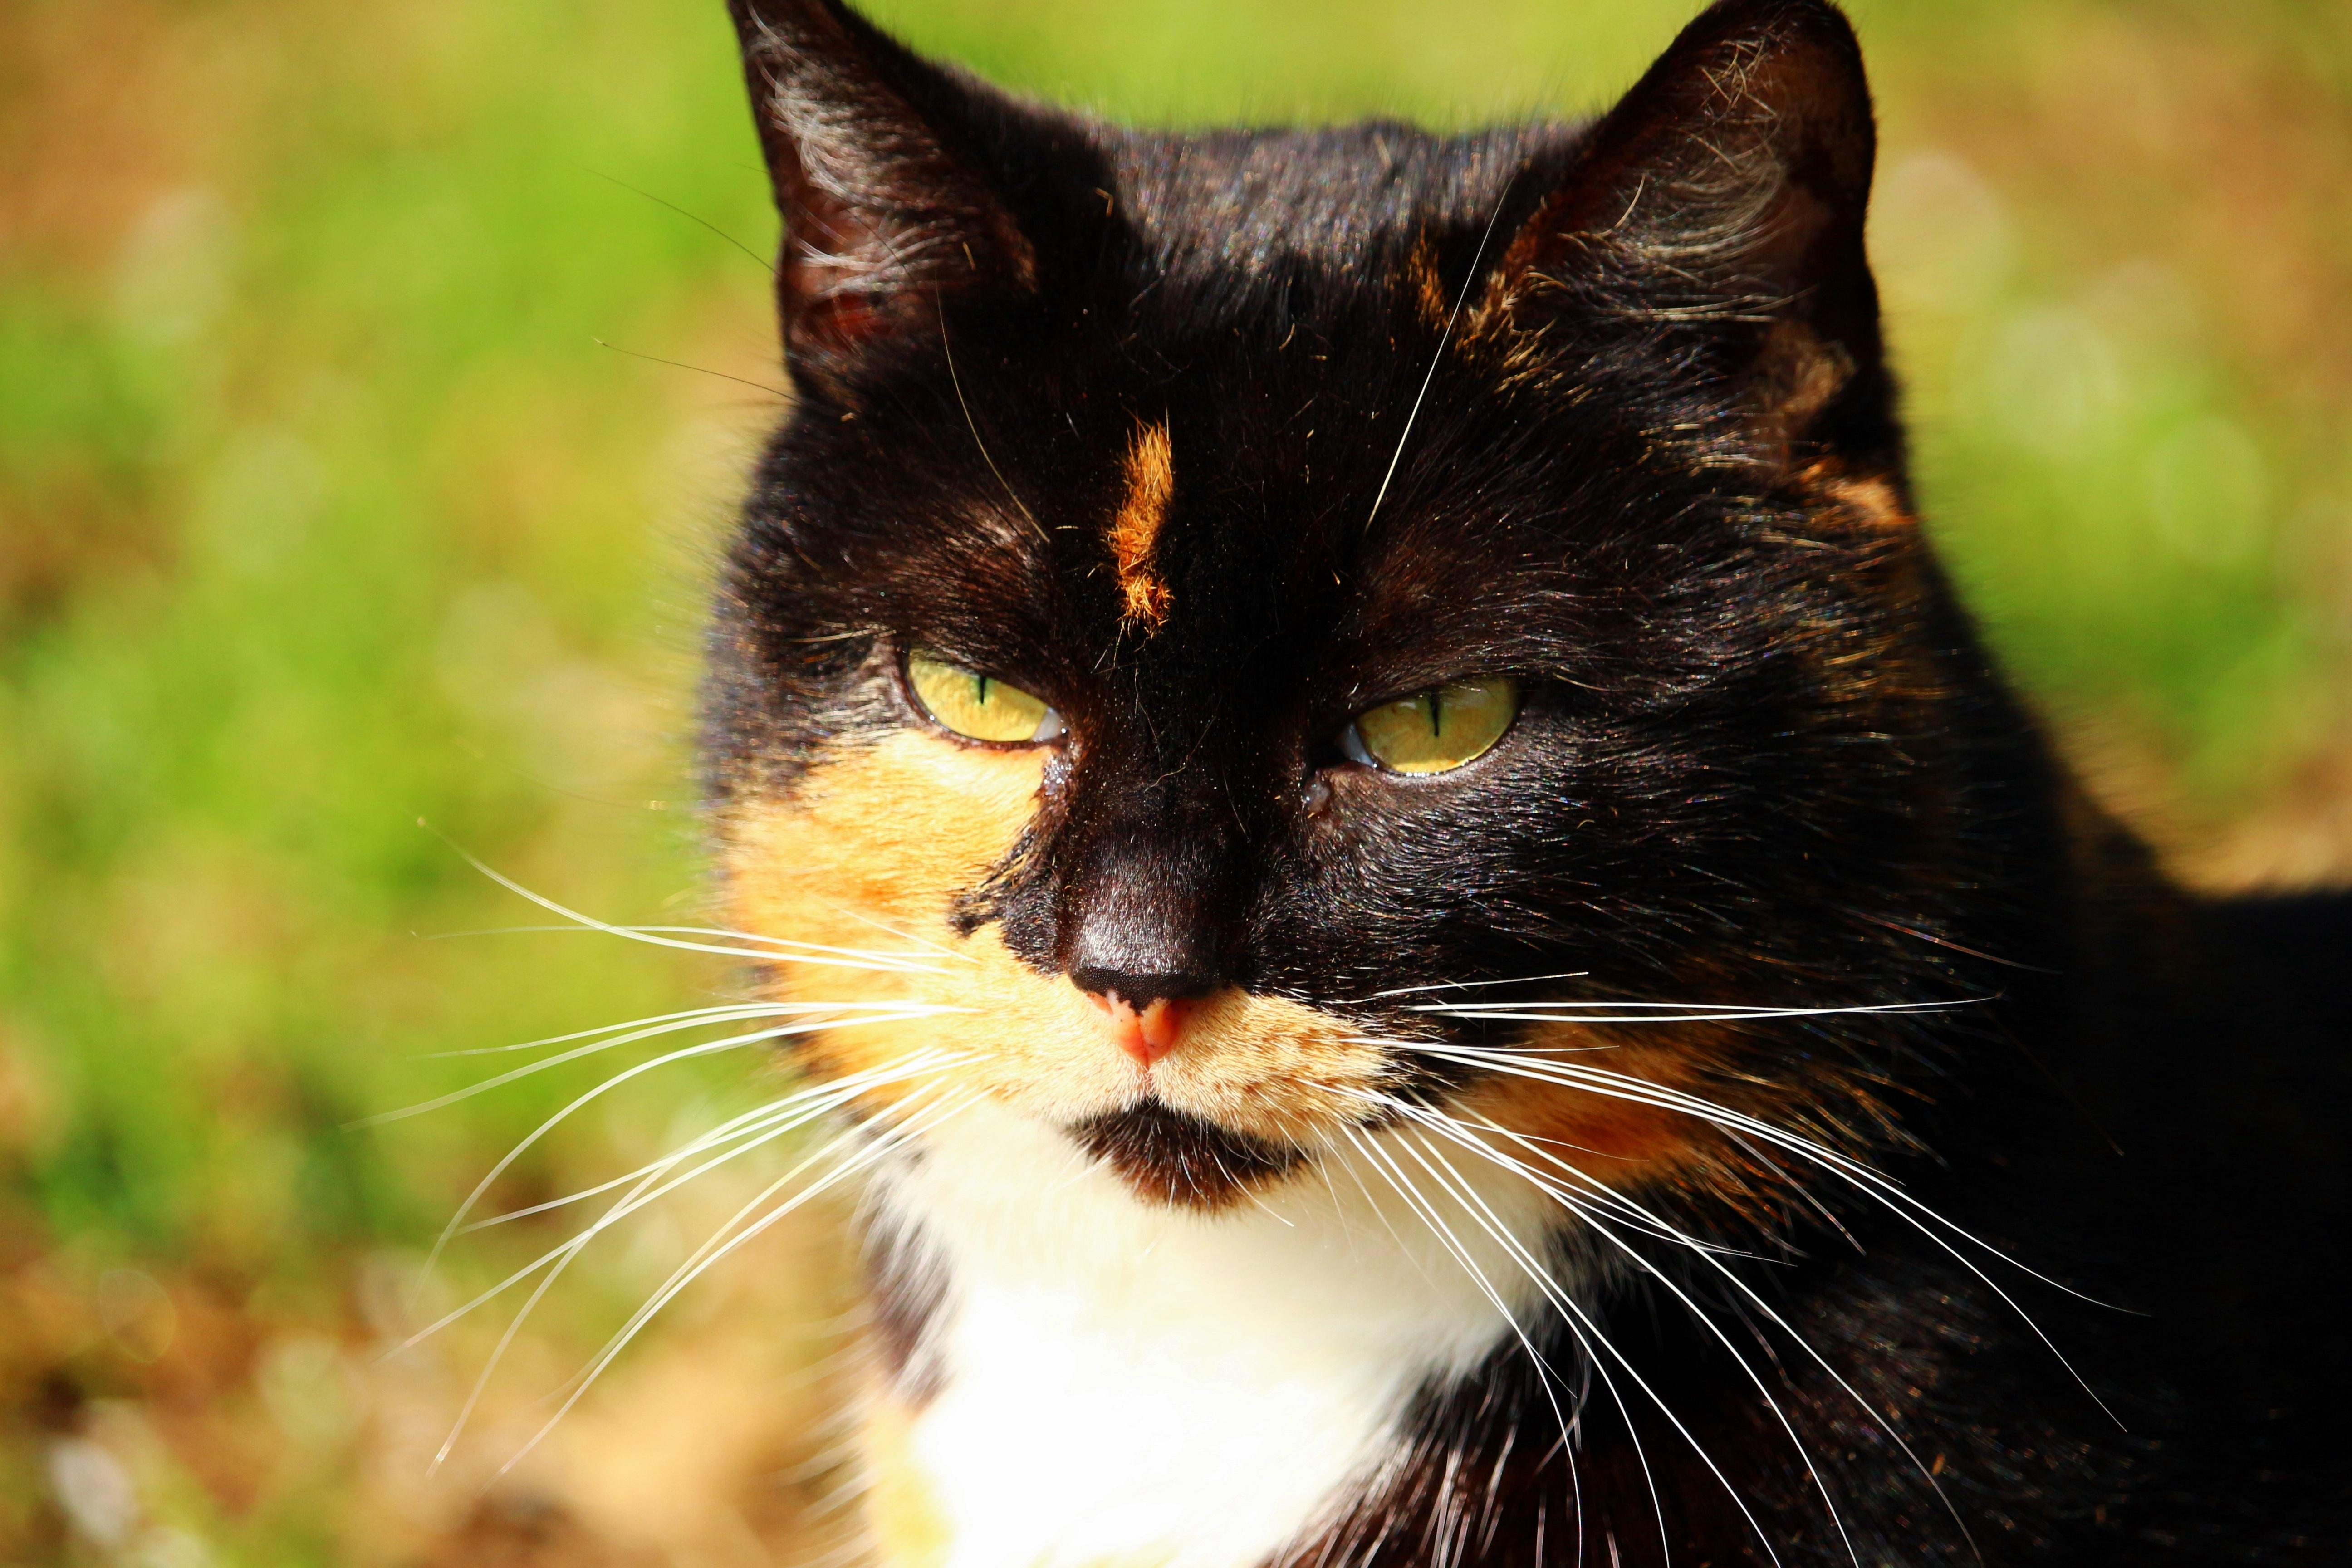 Fotos gratis : sol, gatito, limpiar, gato negro, fauna, de cerca ...